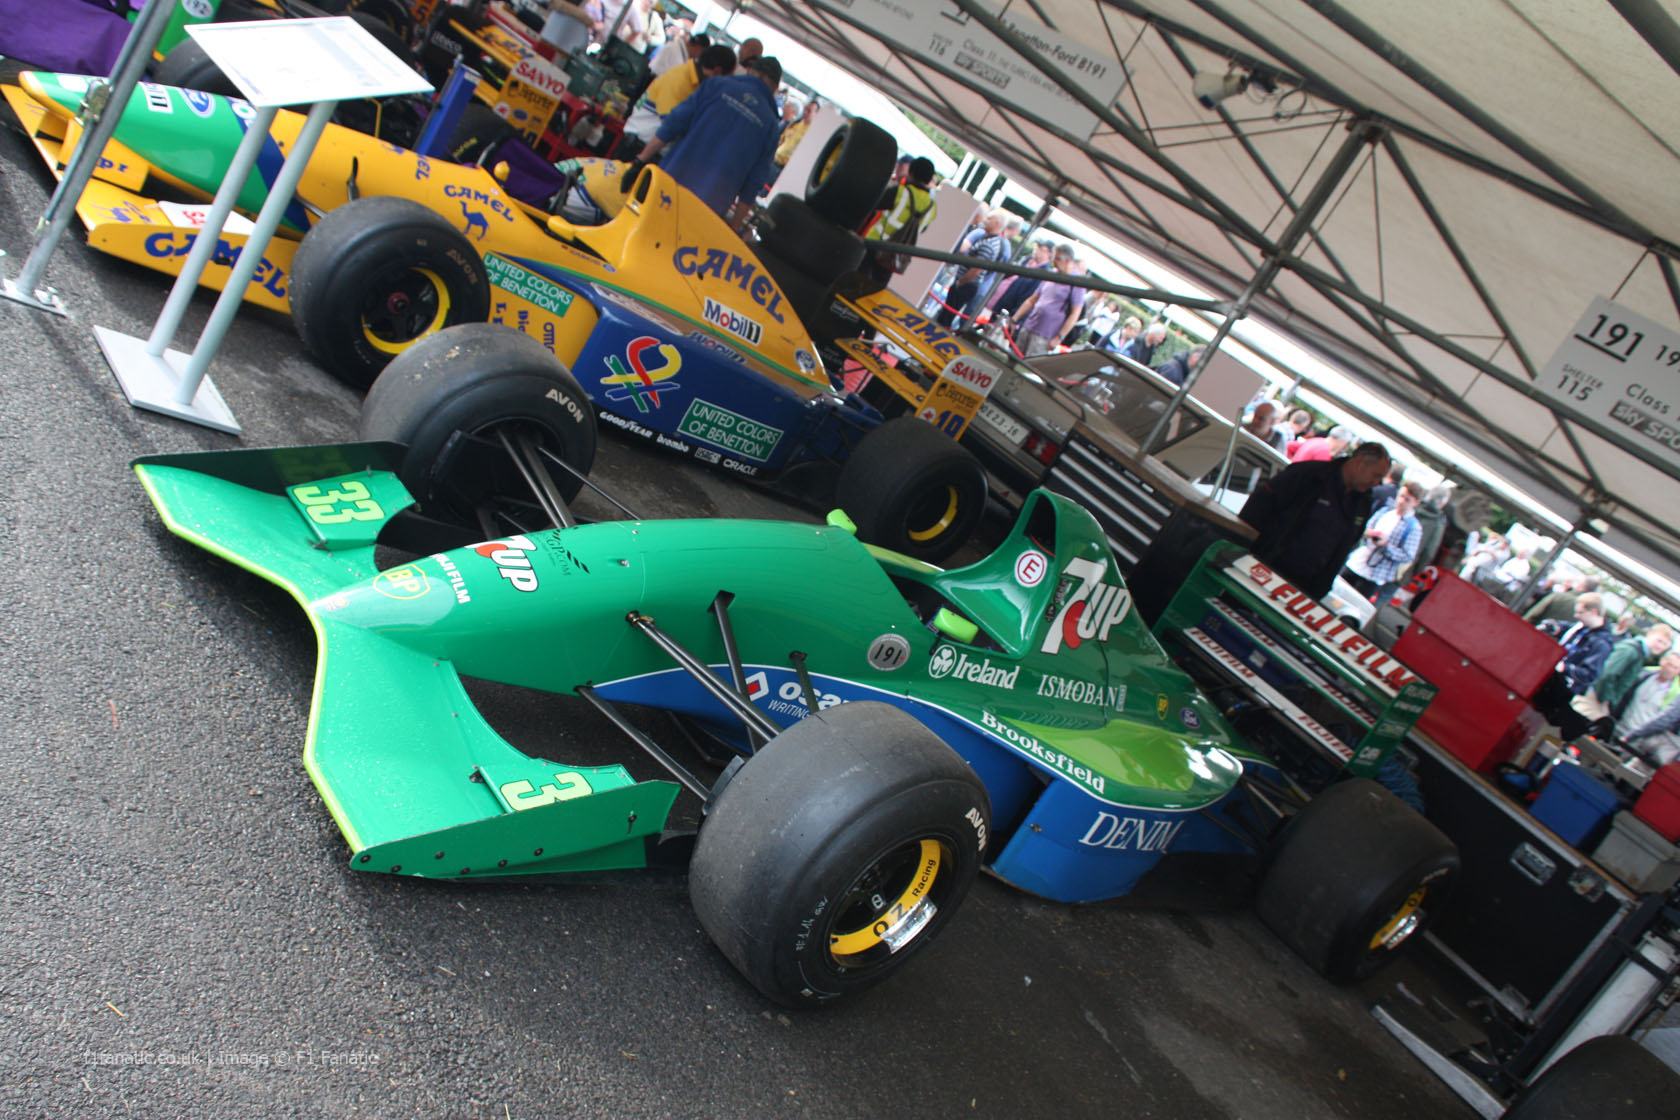 Jordan 191 (2), Goodwood Festival of Speed, 2014